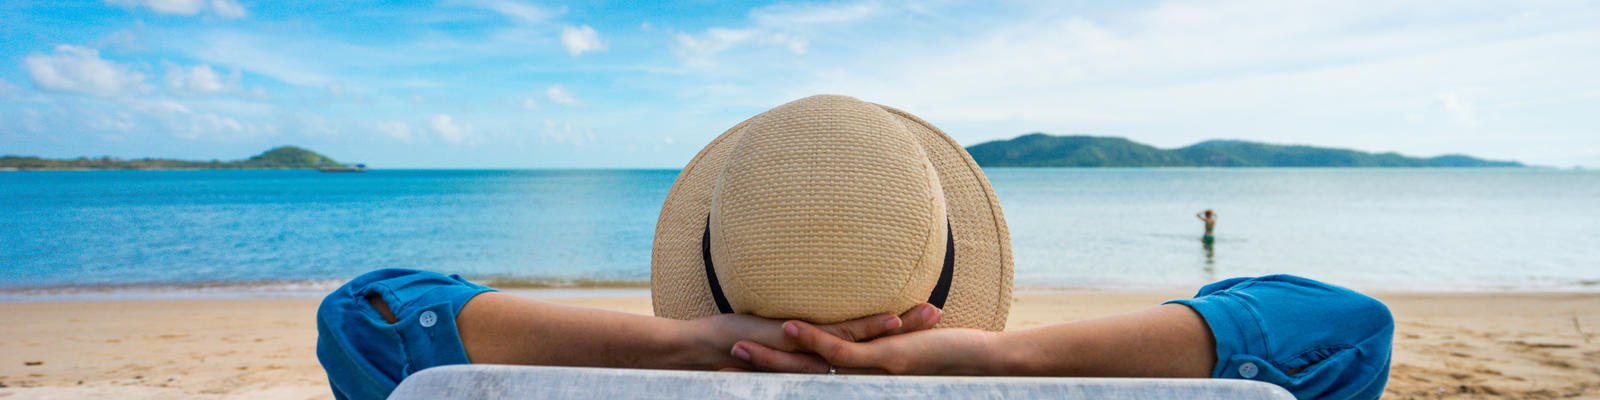 Woman Enjoying Vacation by Beach (Photo: PIXA/Shutterstock)